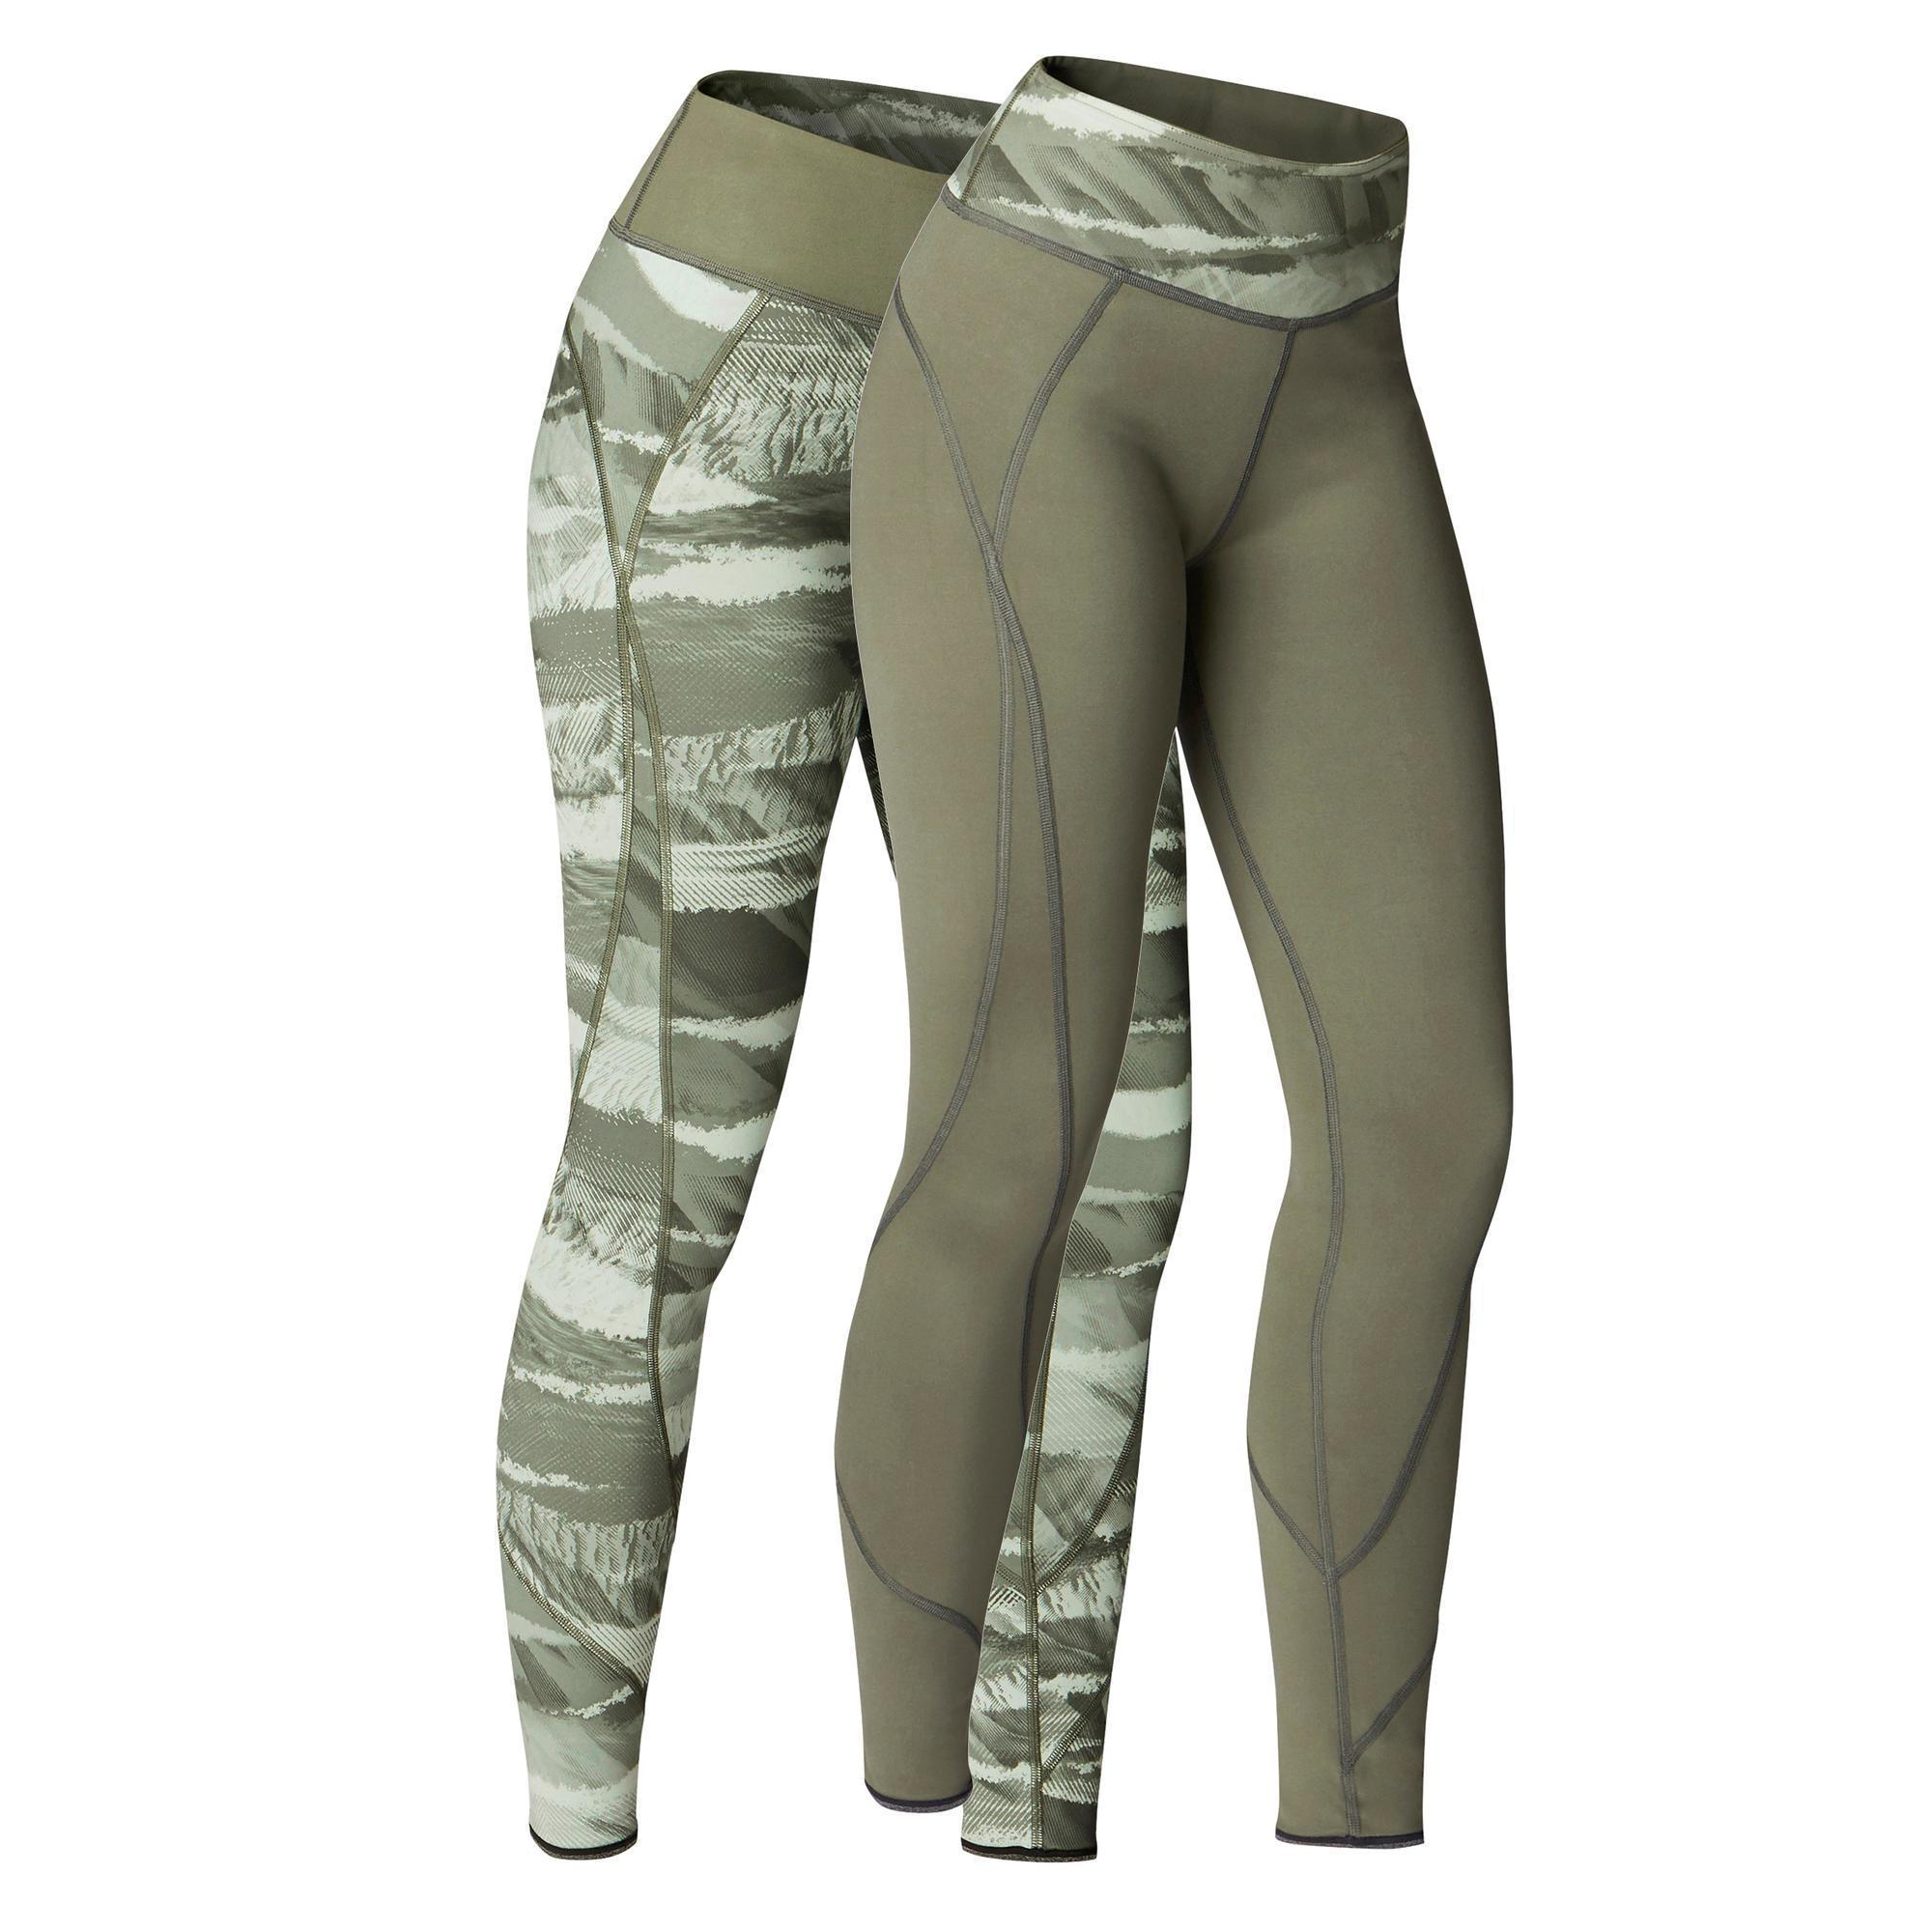 41df8b3f35c77 Yoga+ 920 Women's Reversible Leggings - Khaki | Domyos by Decathlon